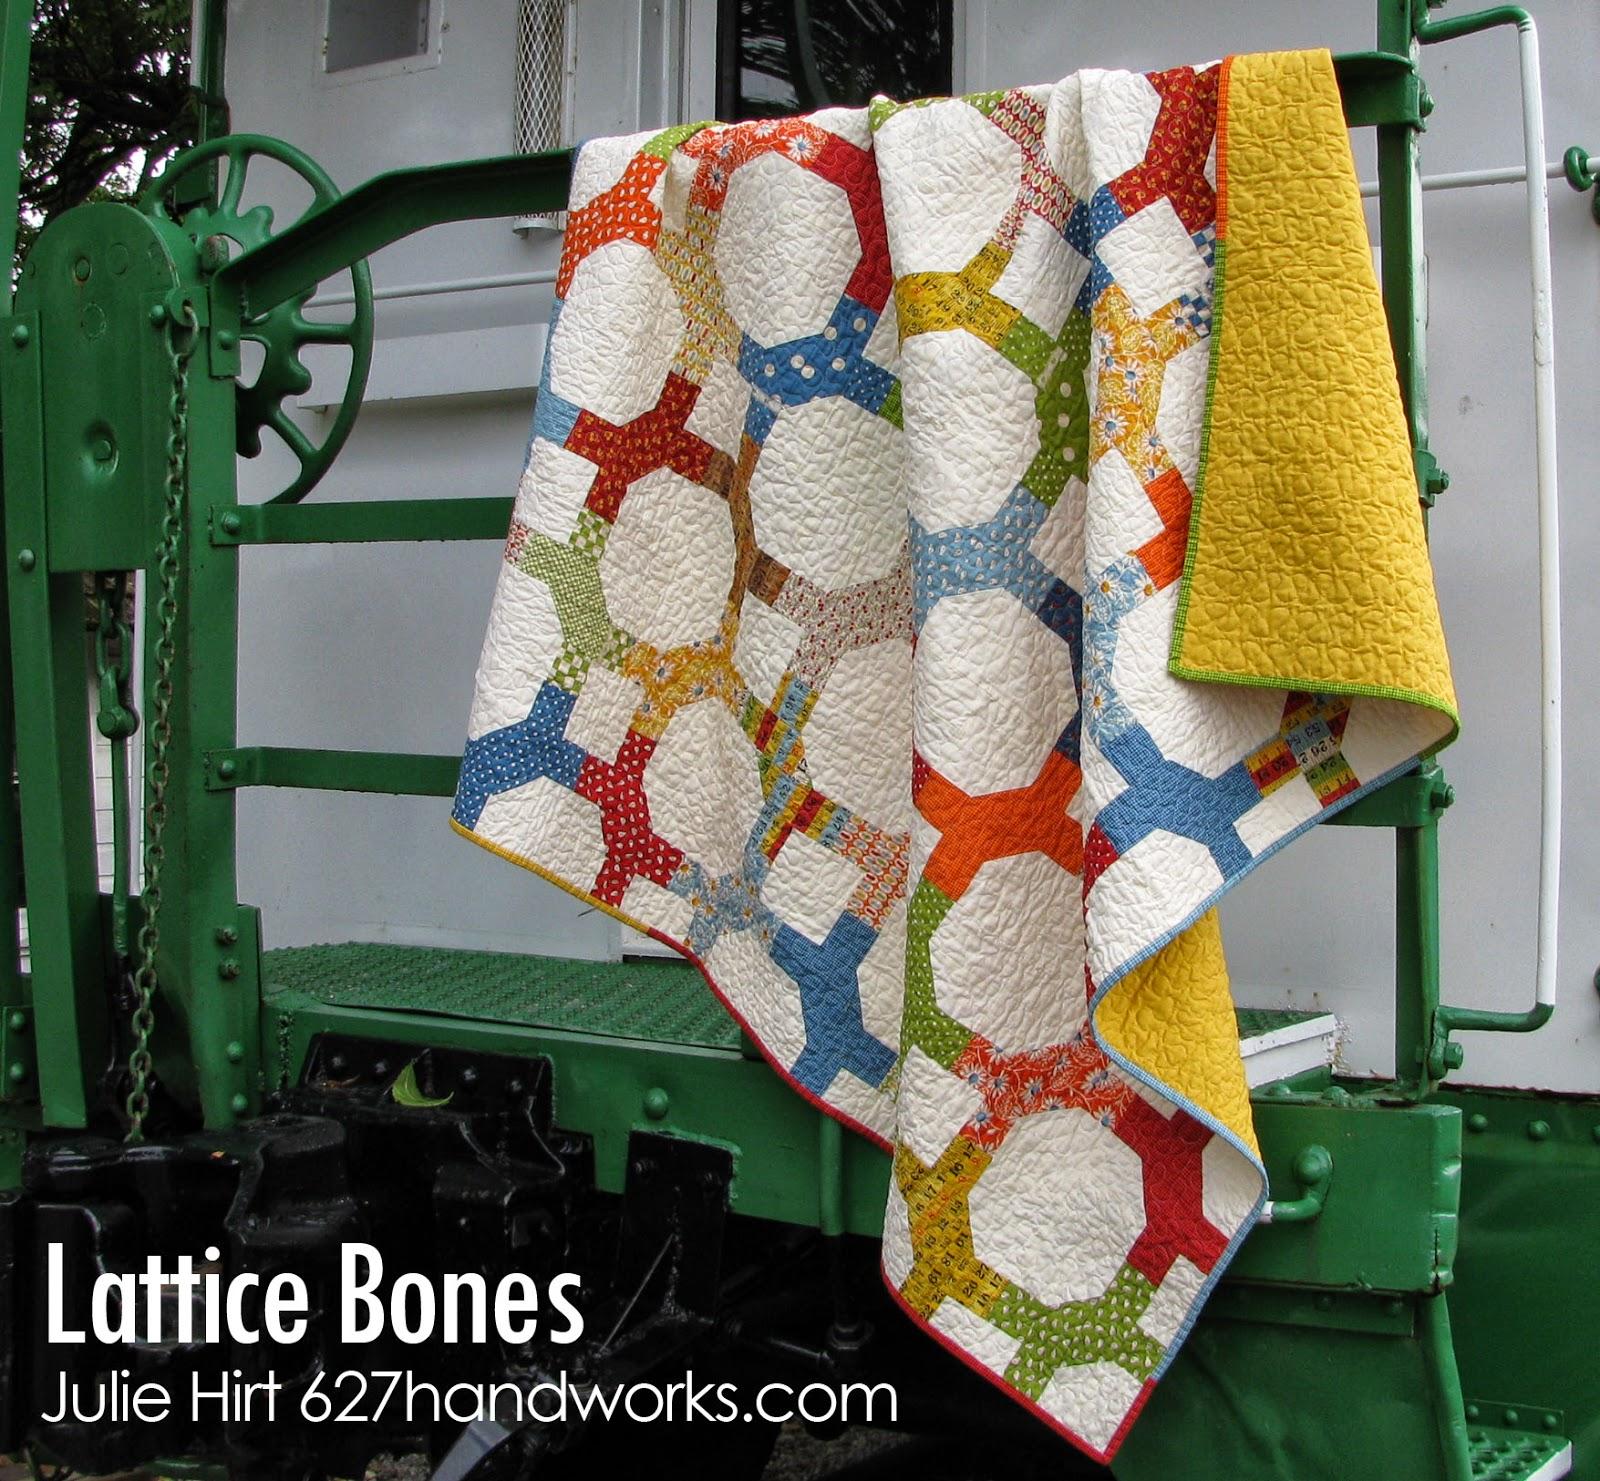 Lattice bones quilt 171 moda bake shop